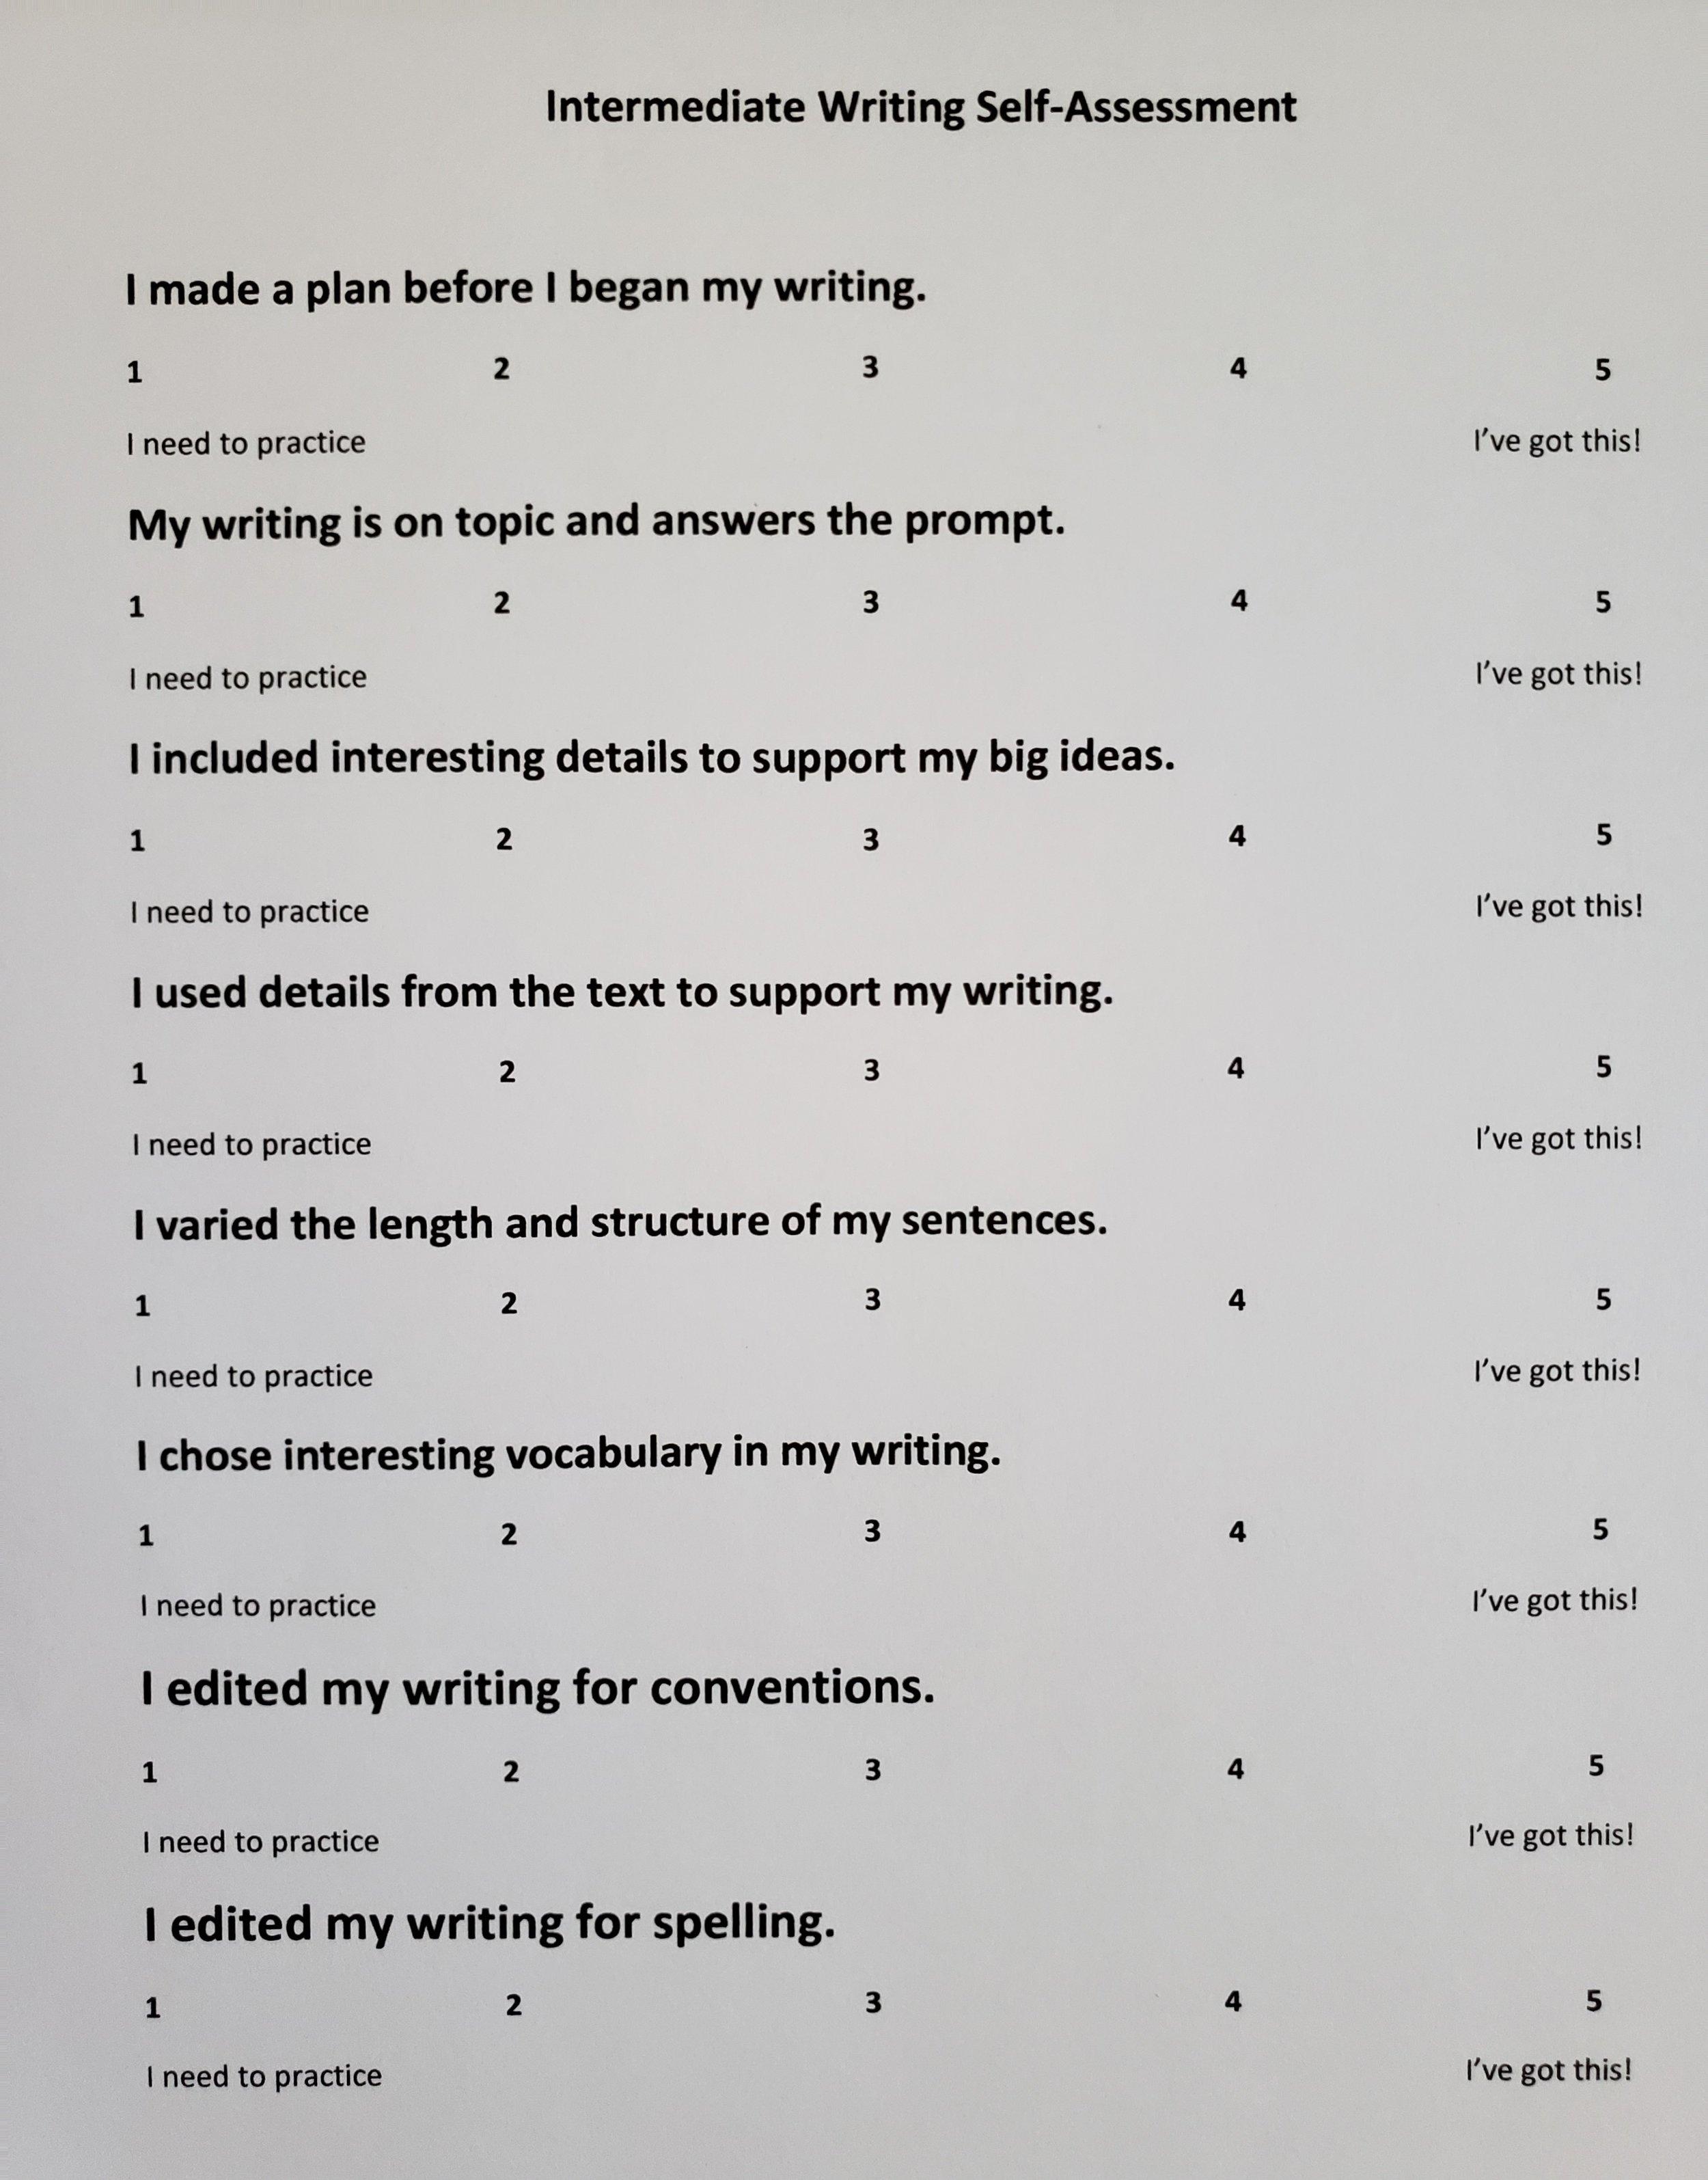 Intermediate Writing Self-Assessment.jpg